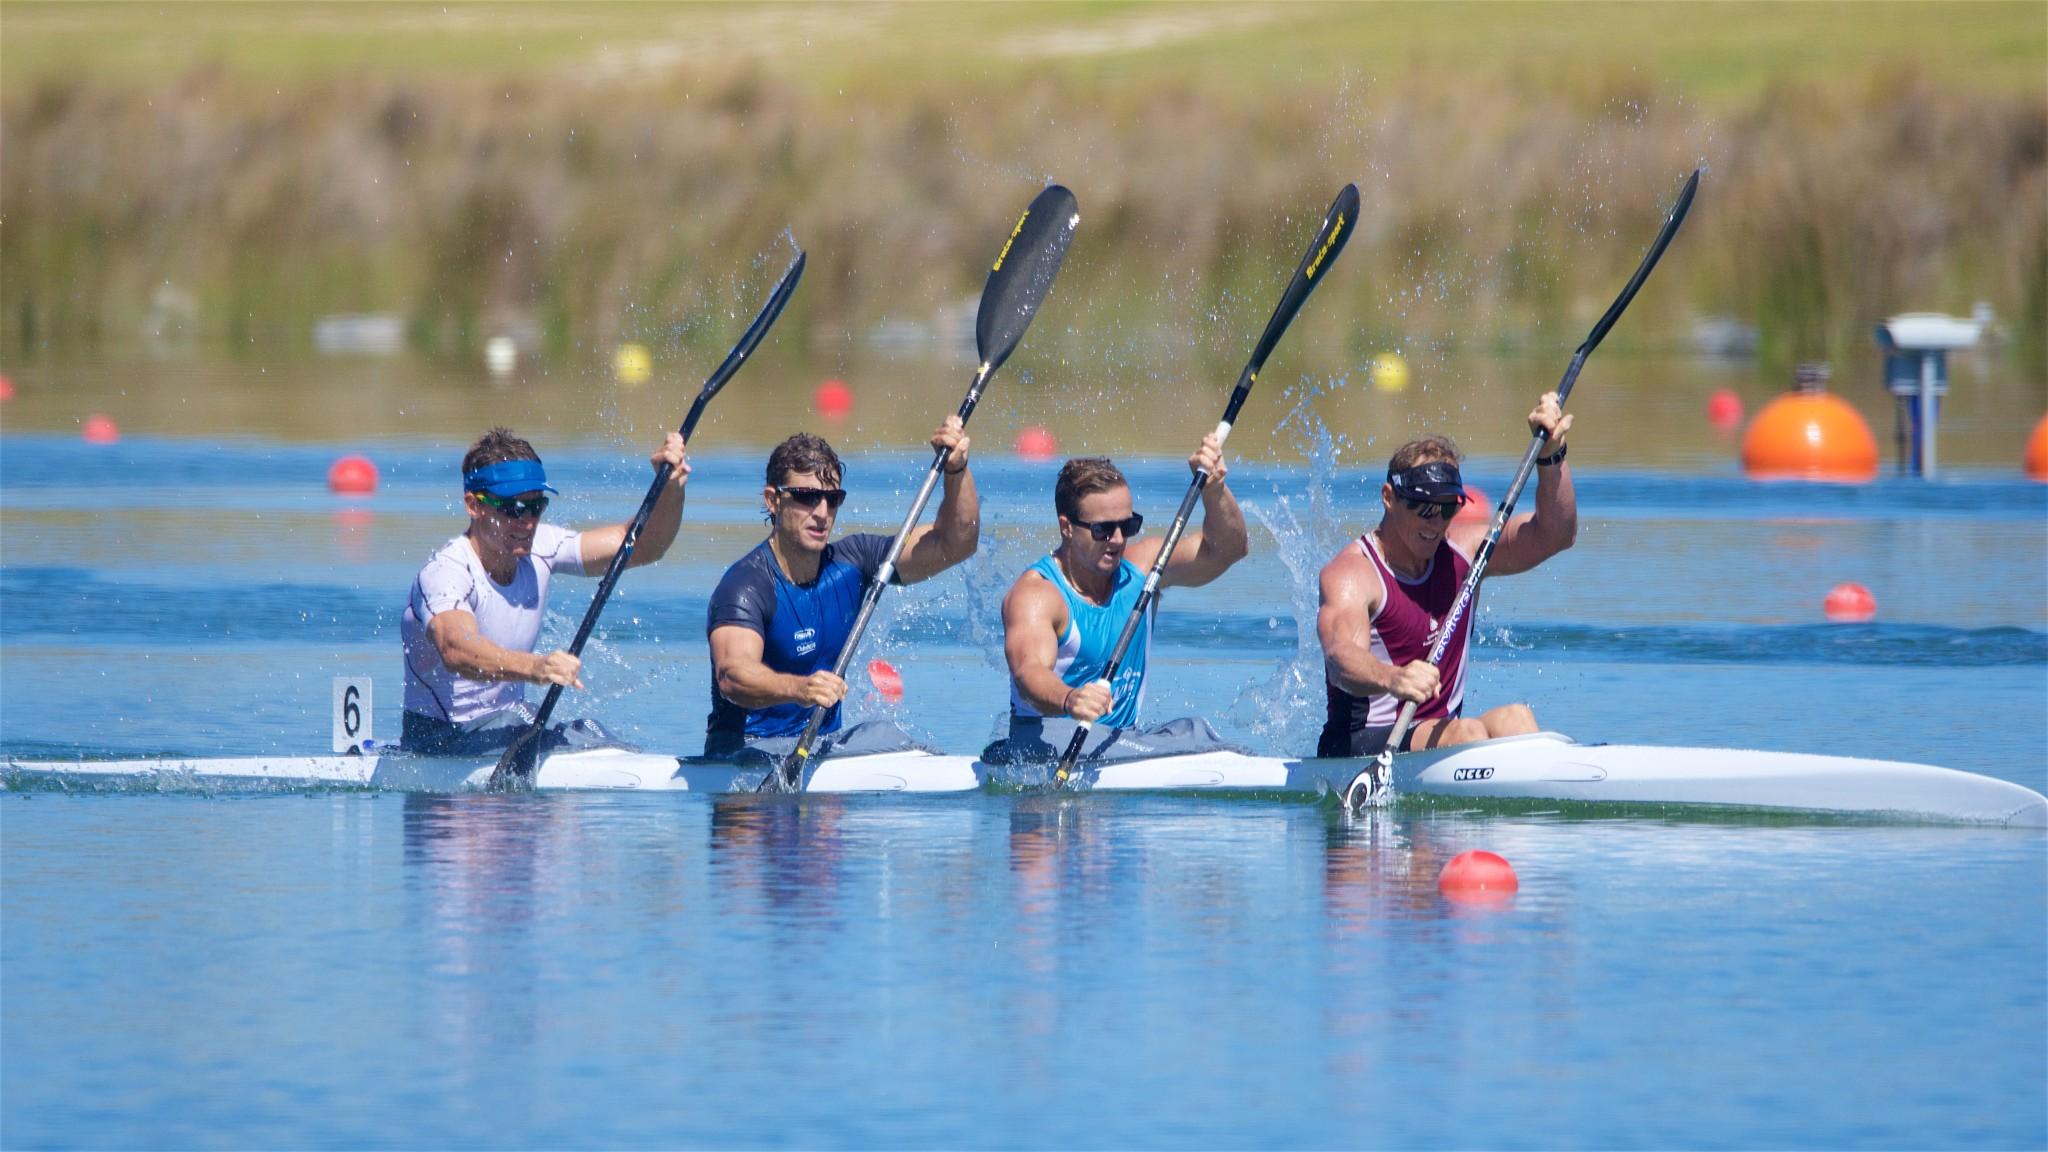 Australians Plot Quest For Kayak Gold